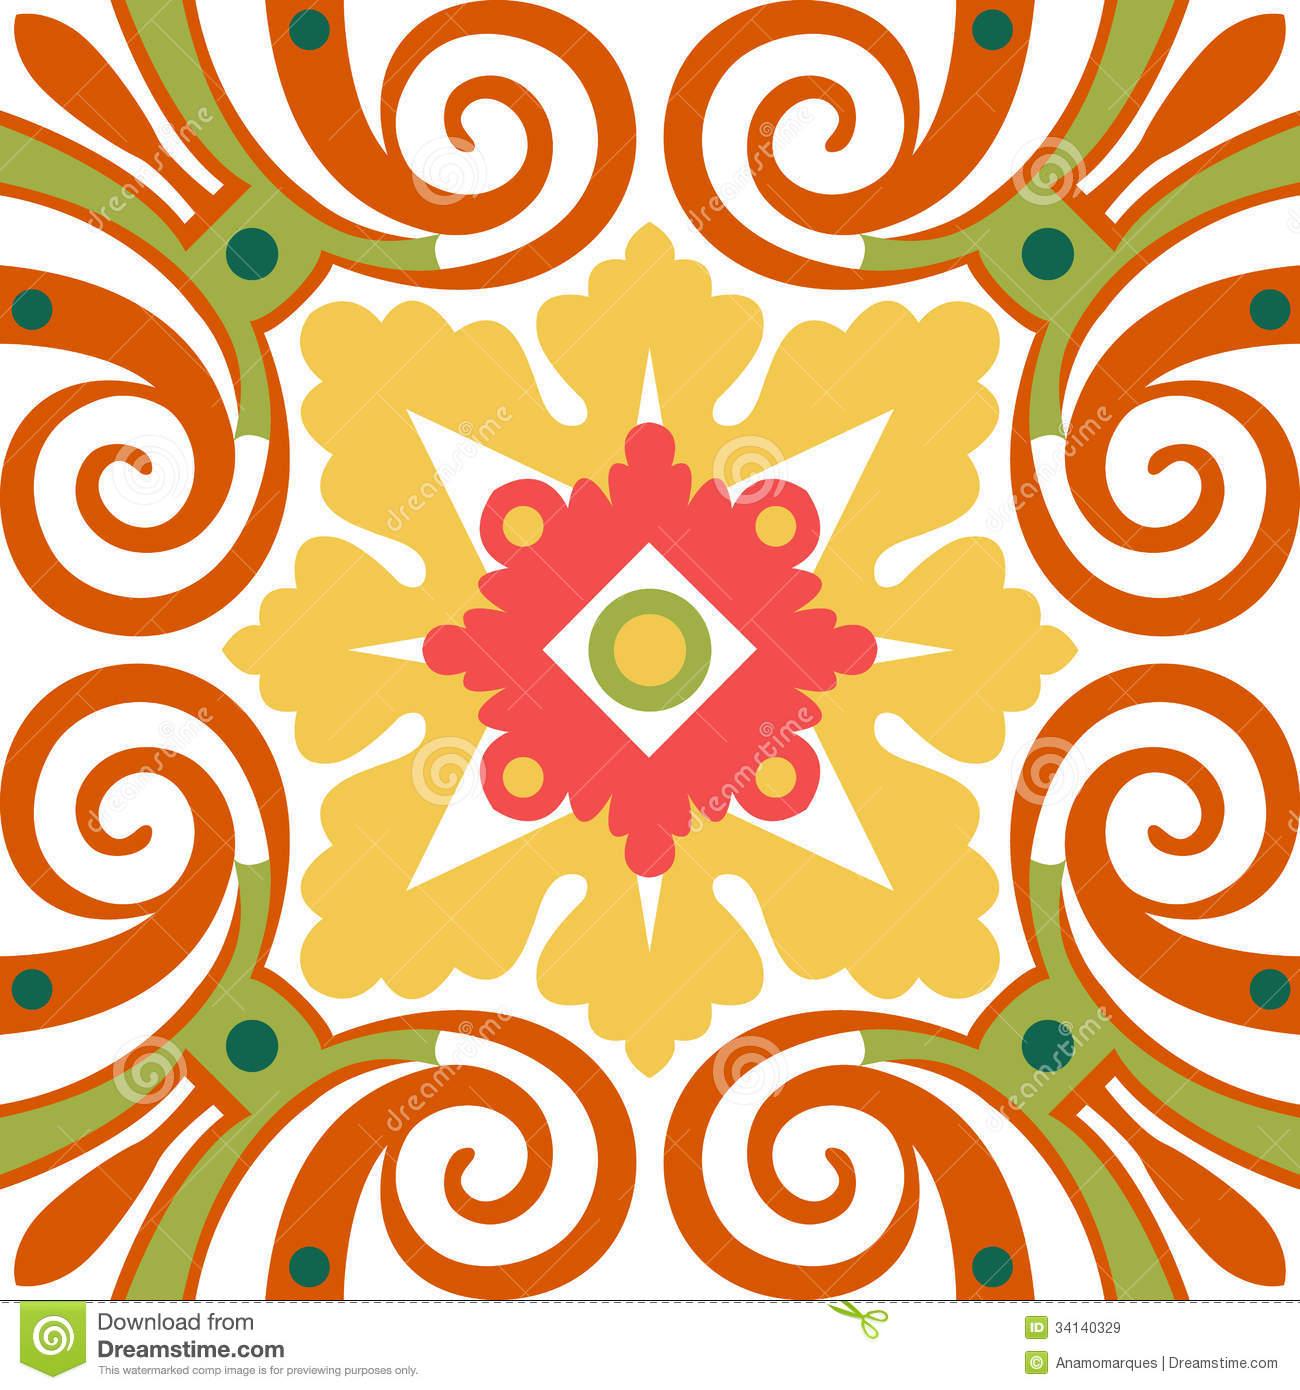 Free Download Spanish Tile Pattern Wallpaper Old Floral